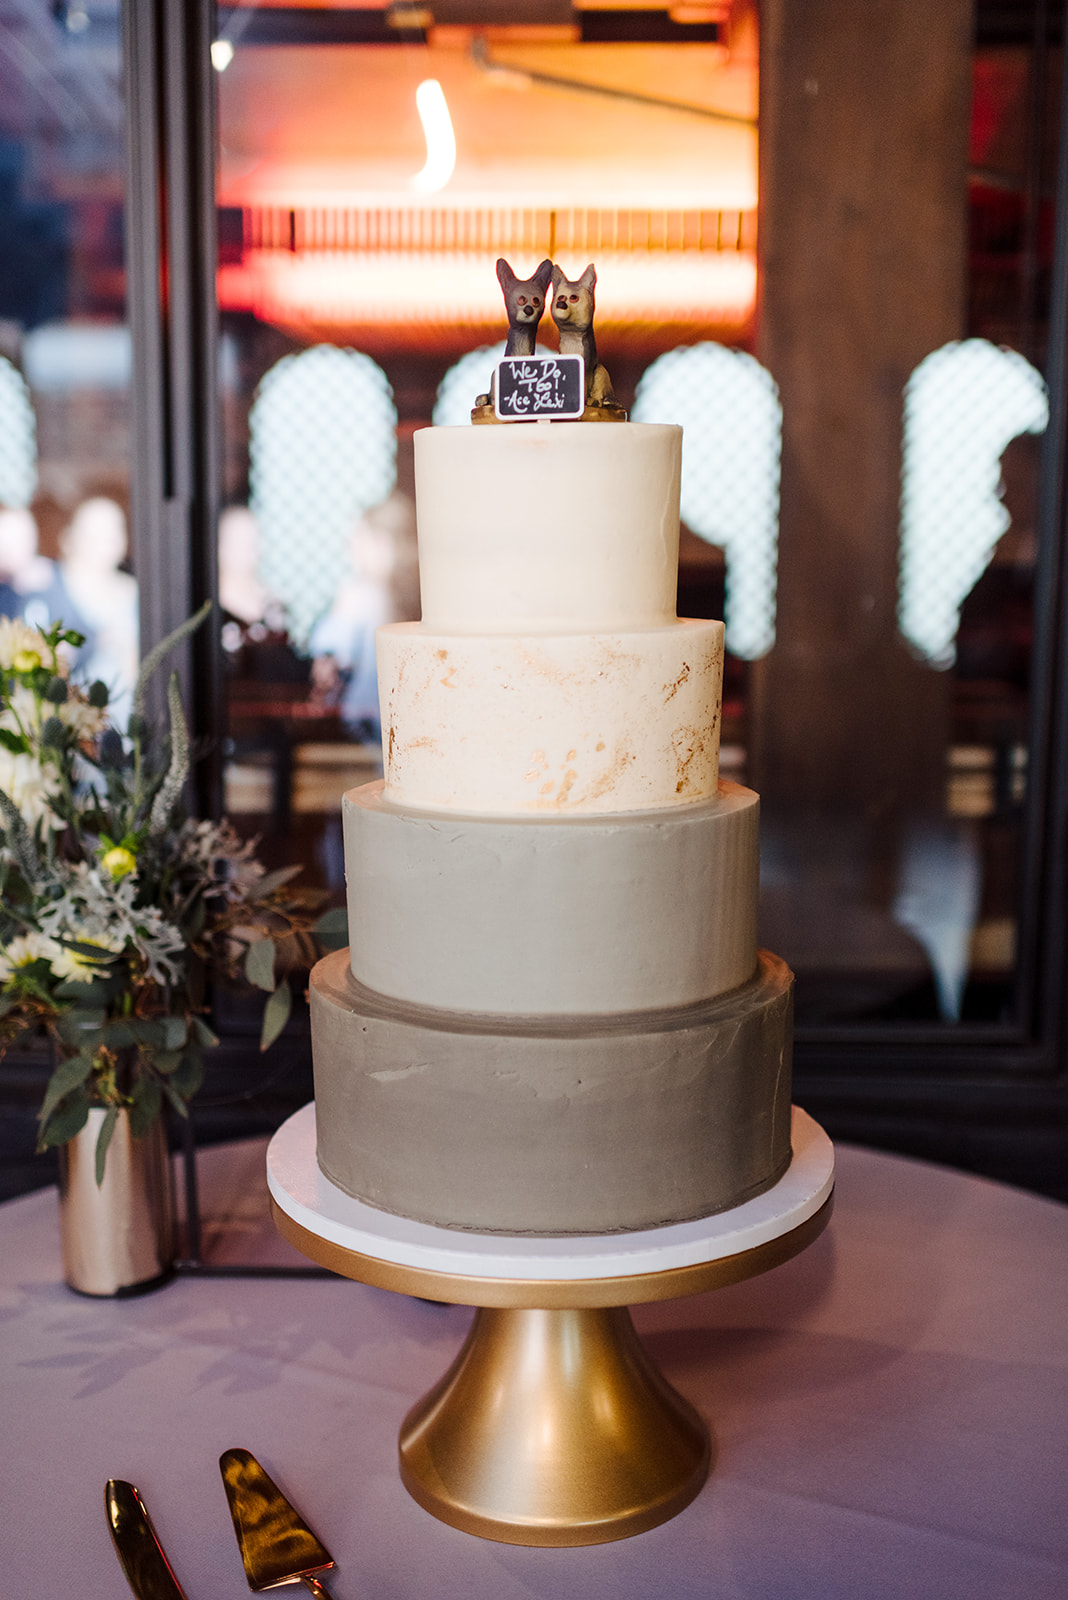 Monochromatic wedding cake: Nashville wedding at Clementine featured on Nashville Bride Guide